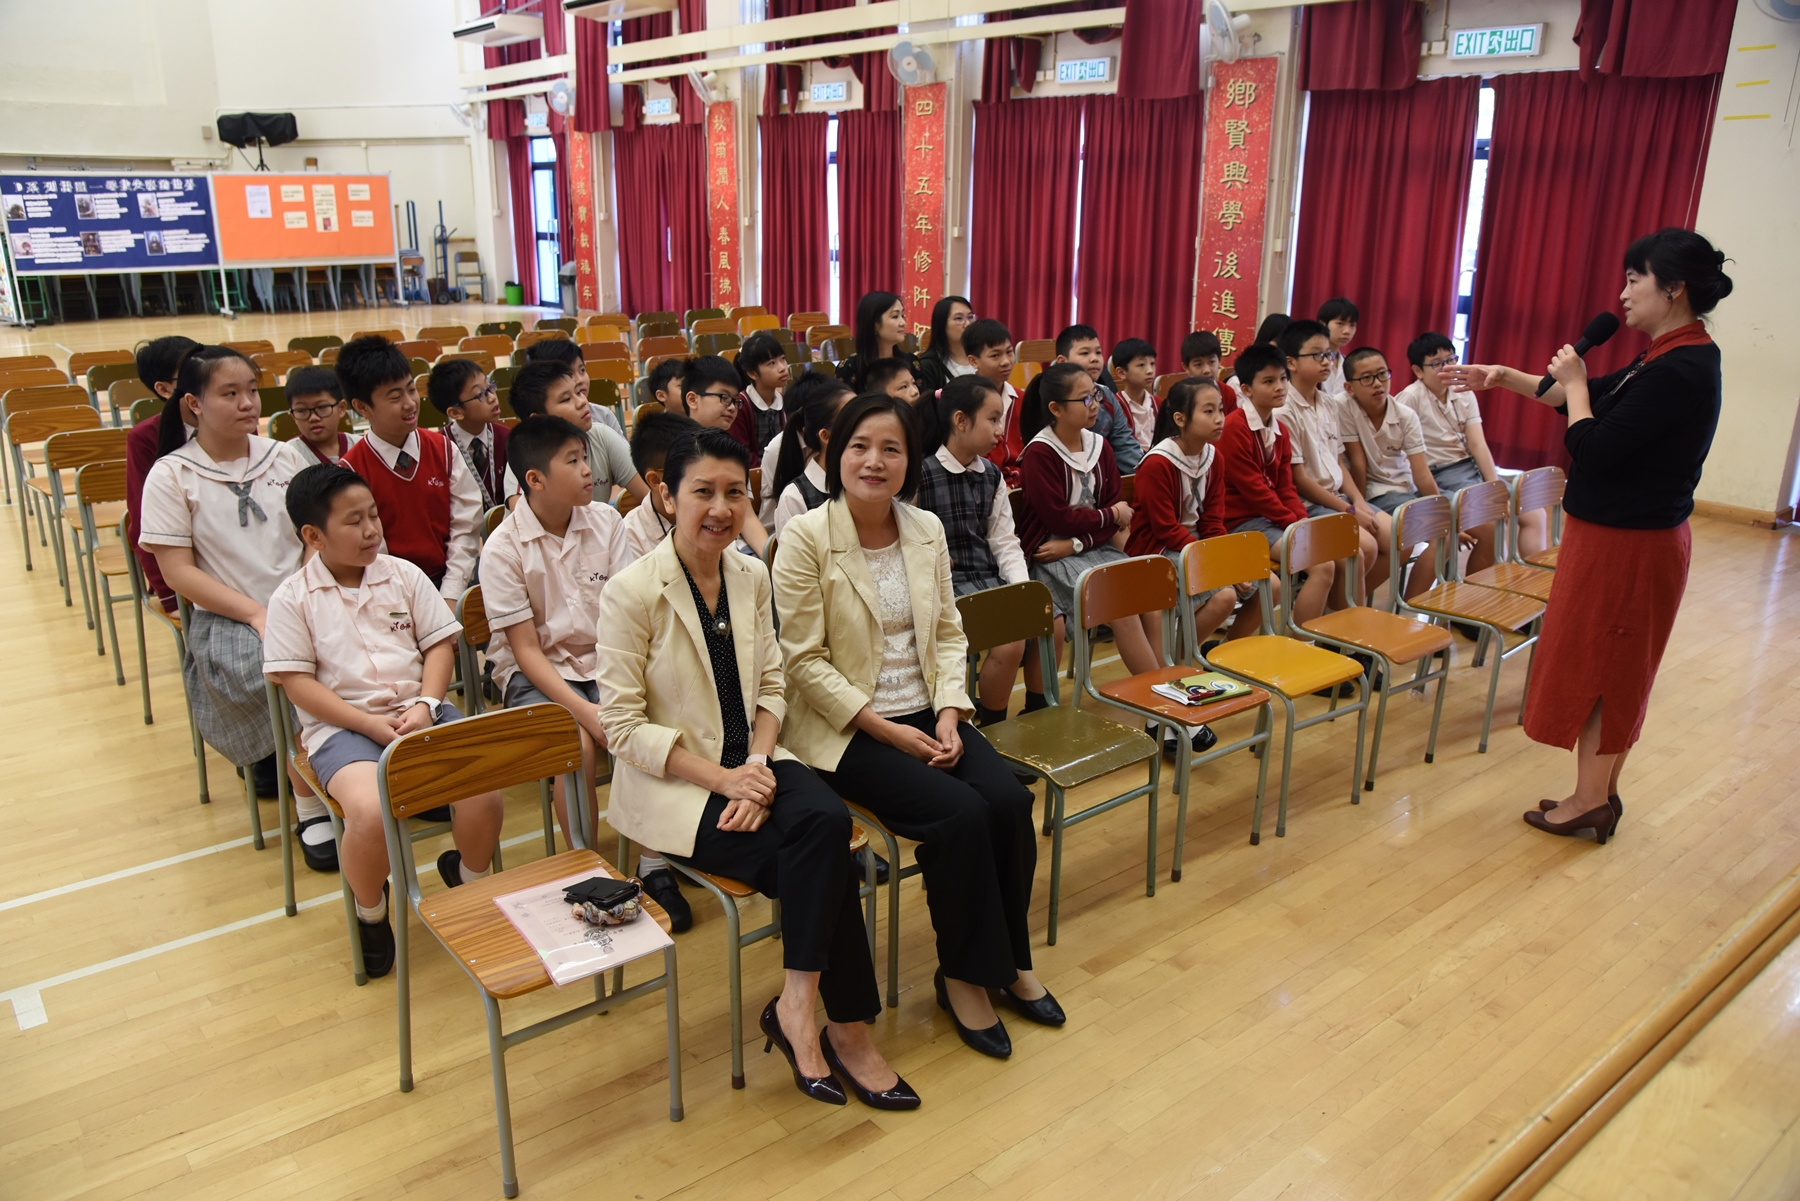 http://npc.edu.hk/sites/default/files/dsc_6973.jpg